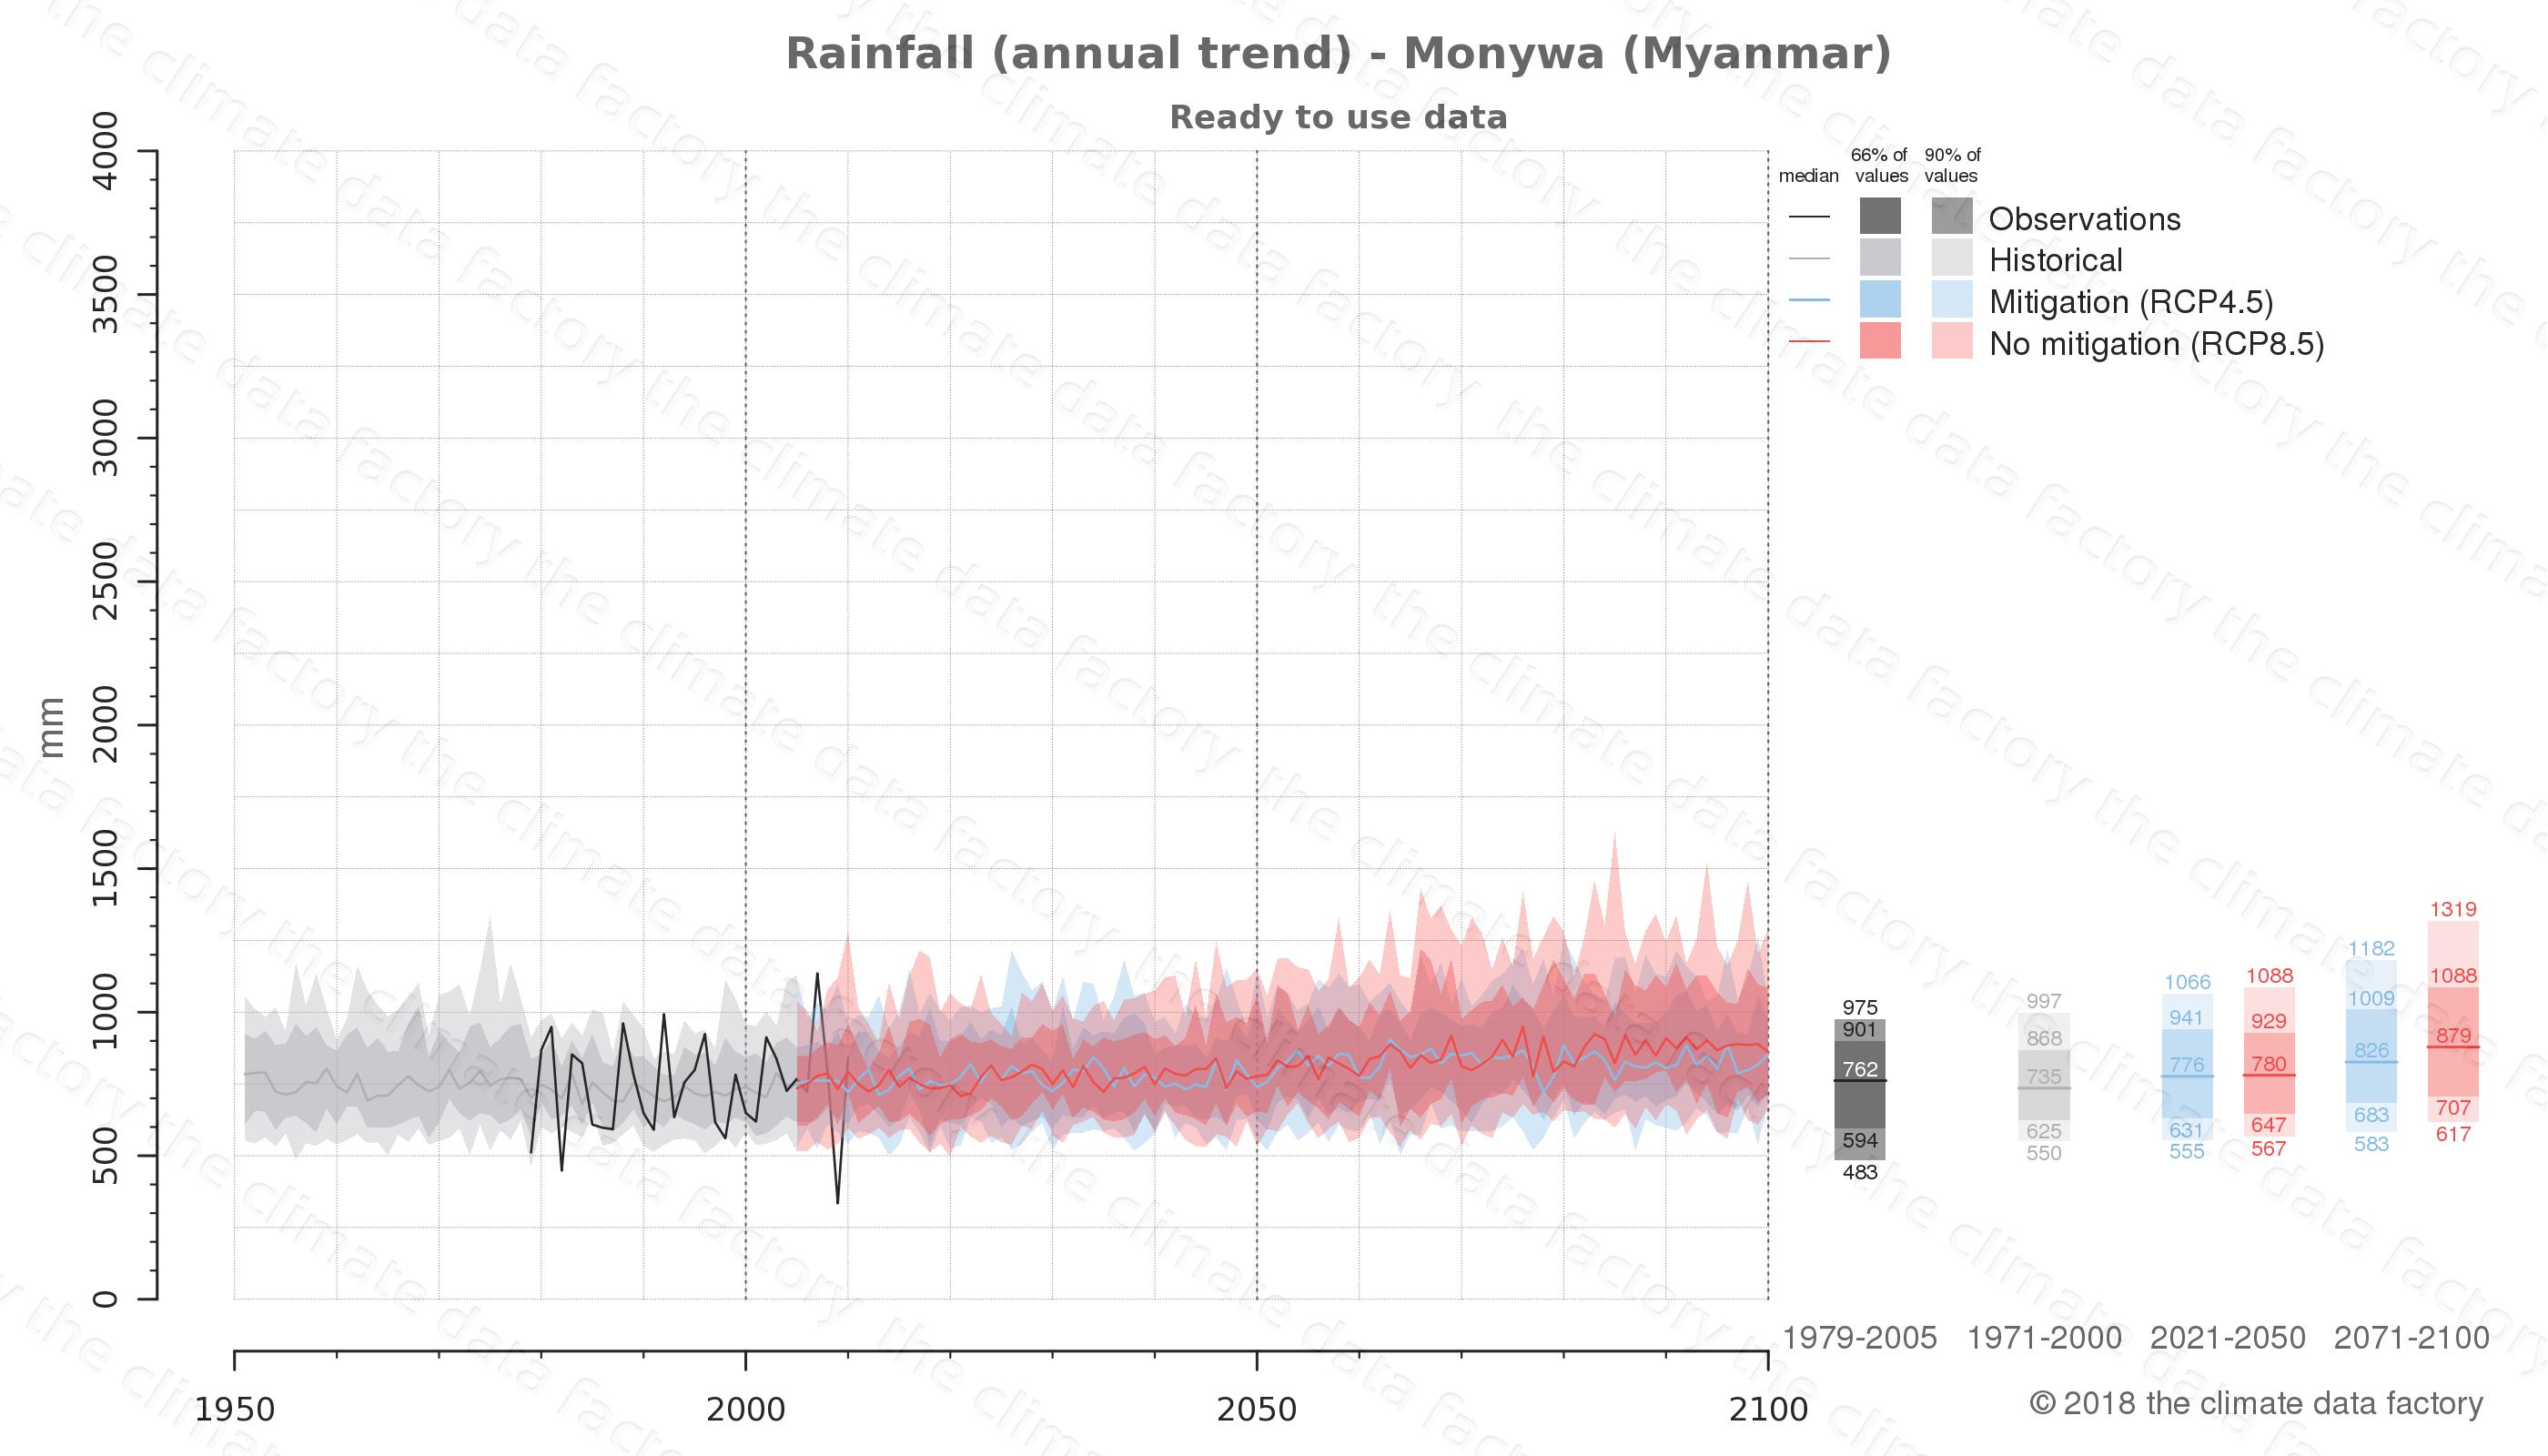 climate change data policy adaptation climate graph city data rainfall monywa myanmar